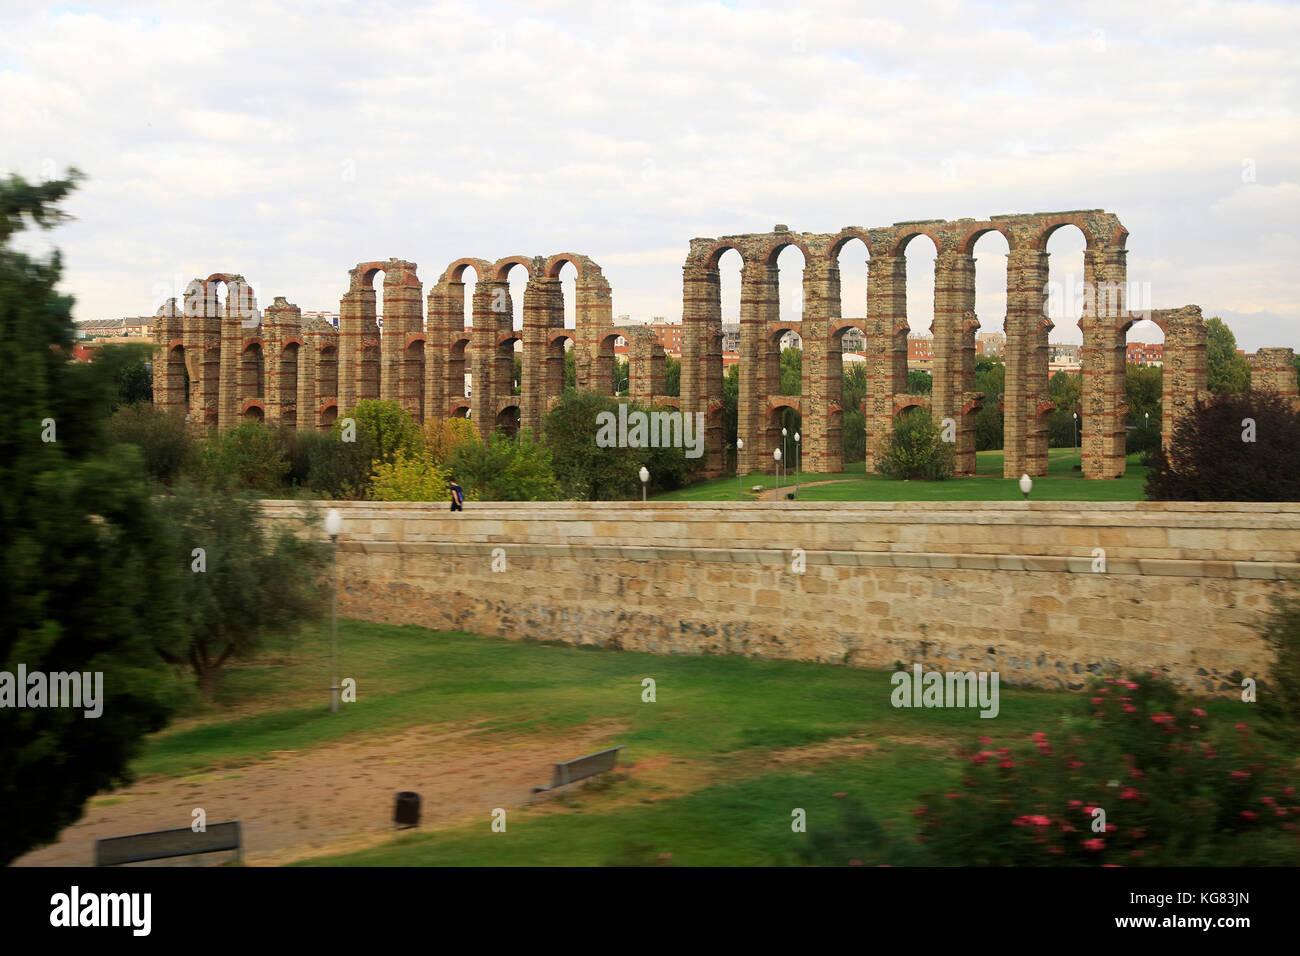 Blurred motion shot from speeding train of Roman aqueduct, Acueducto de Los Milagros, Merida, Extremadura, Spain - Stock Image